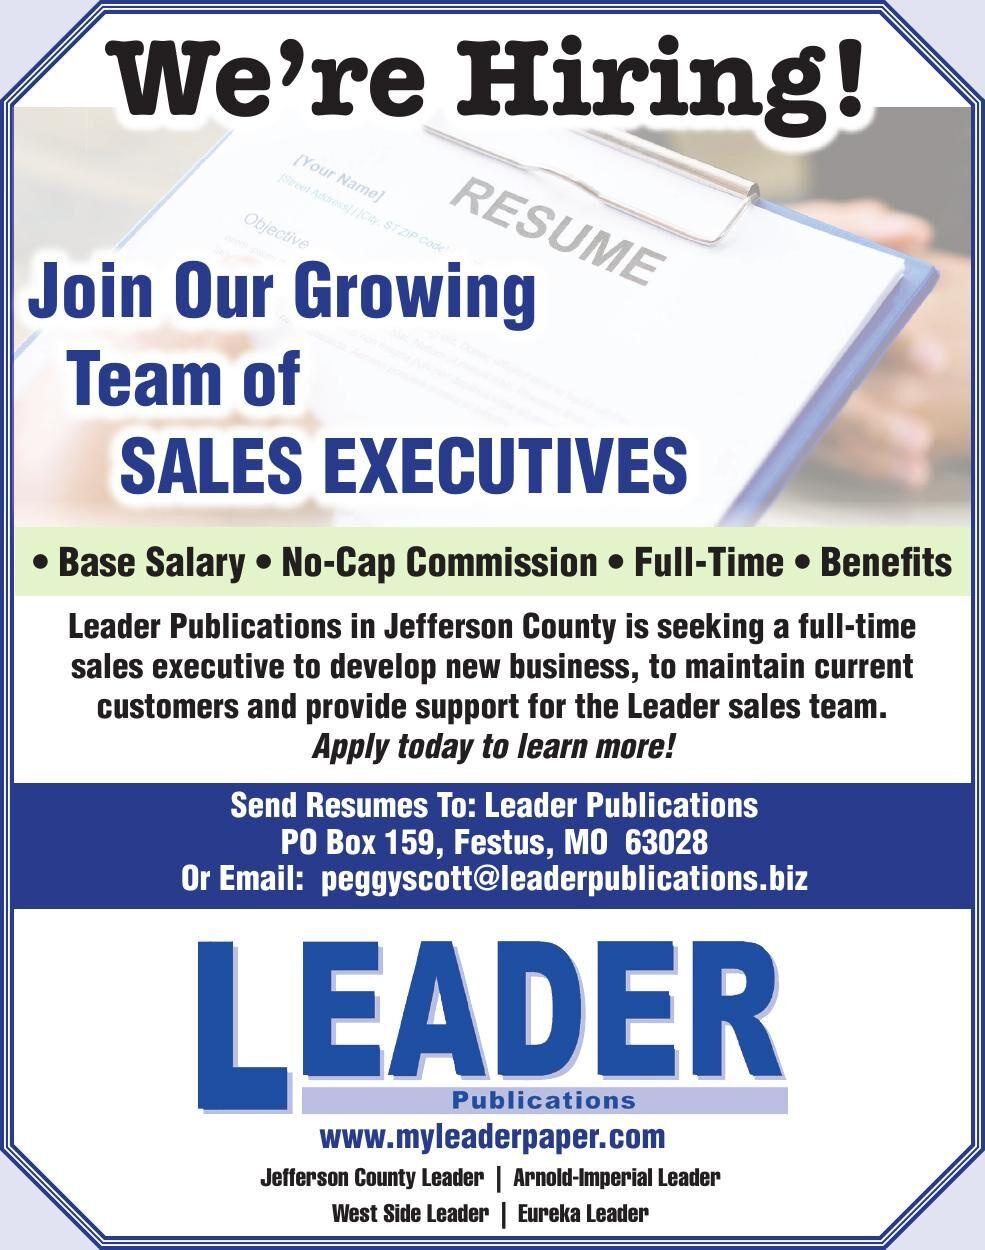 We're Hiring Sales Executive